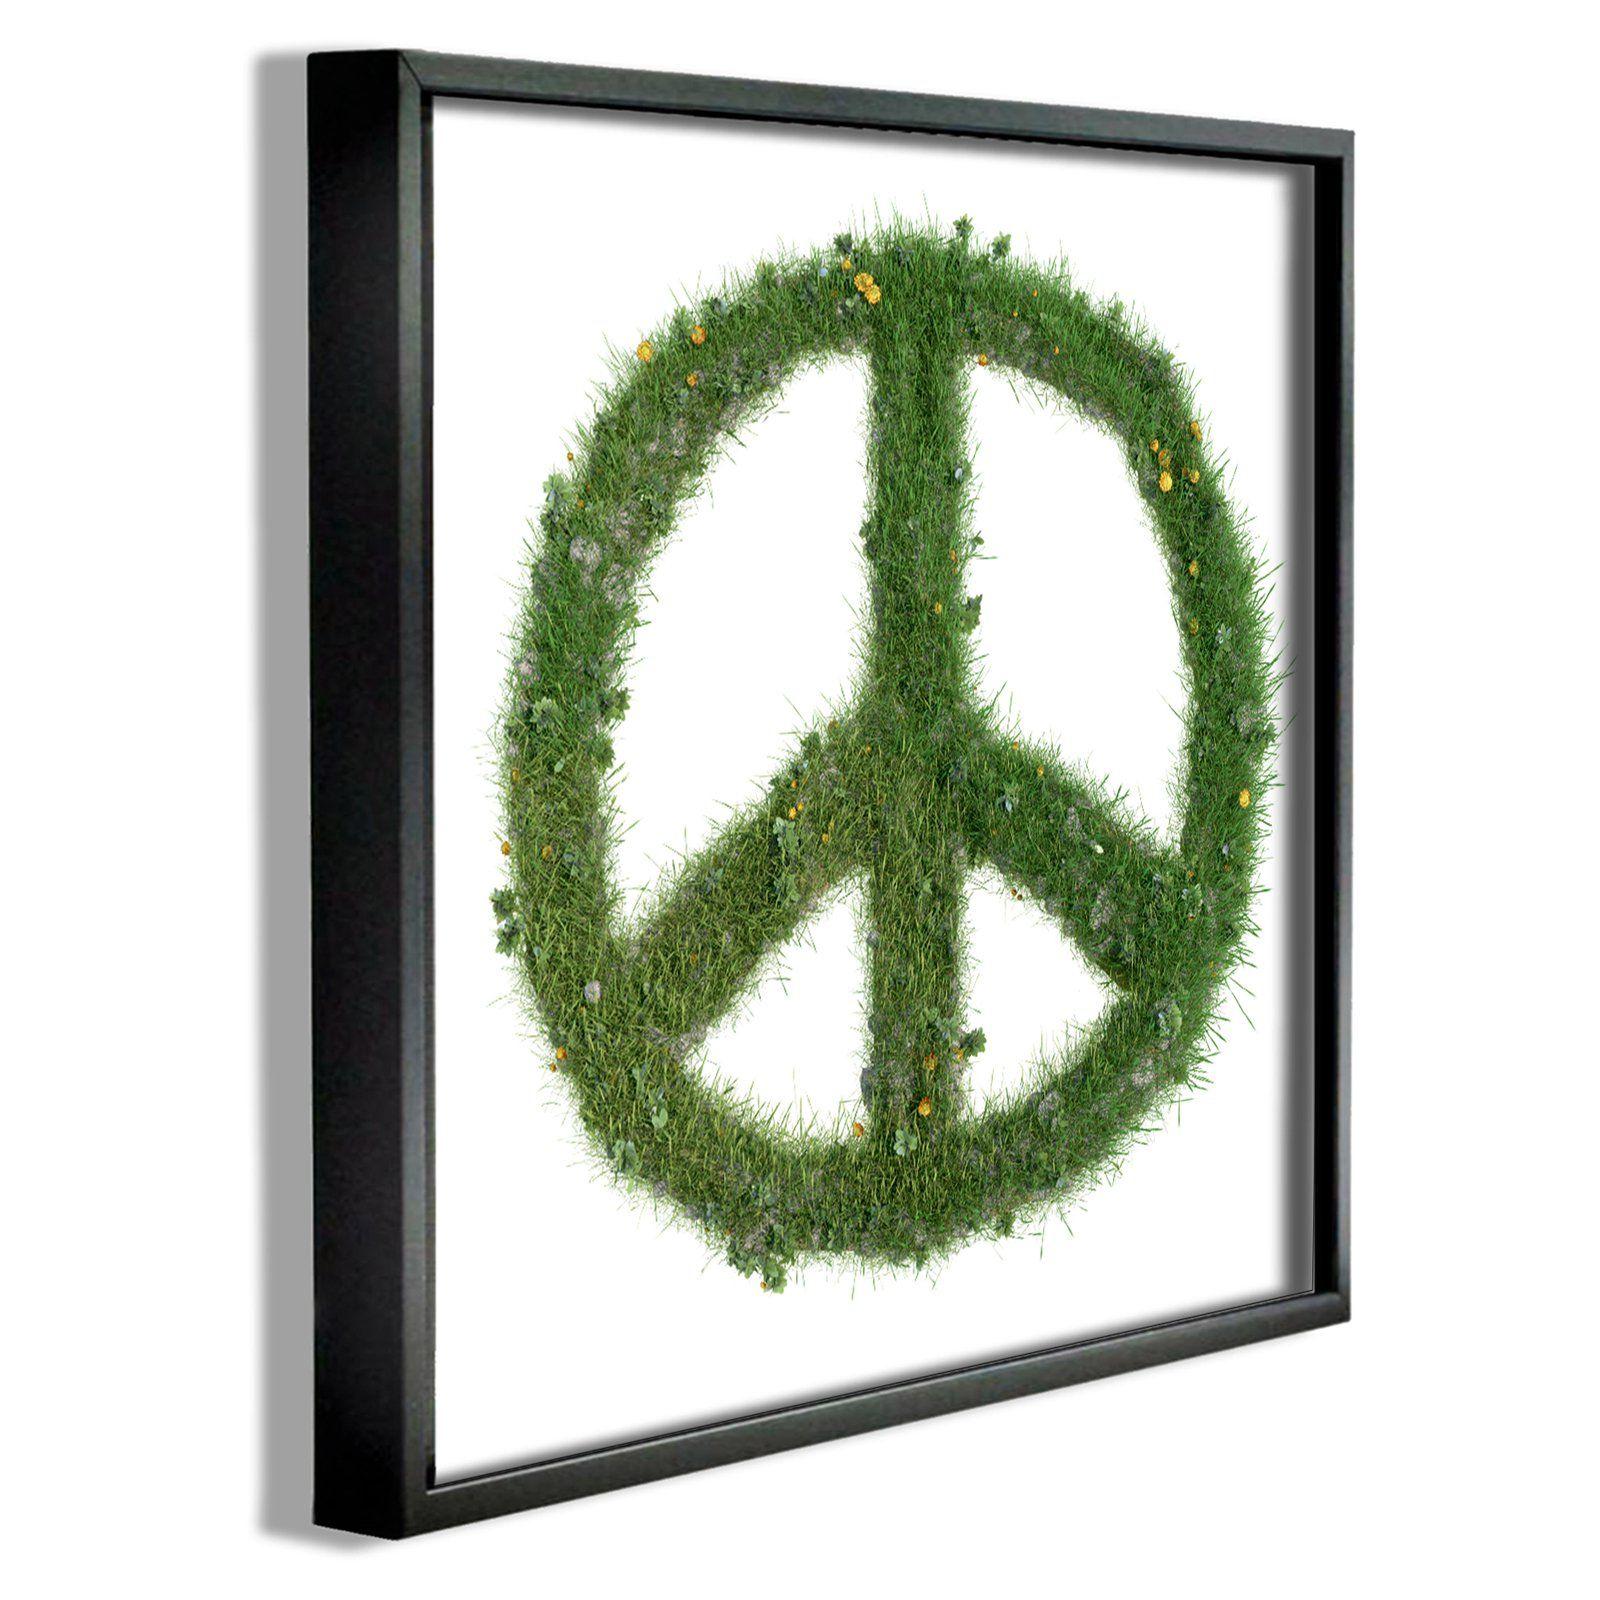 Stupell Decor Grass Peace Sign Framed Giclee Texturized Art - BRP-1941_FR_12X12